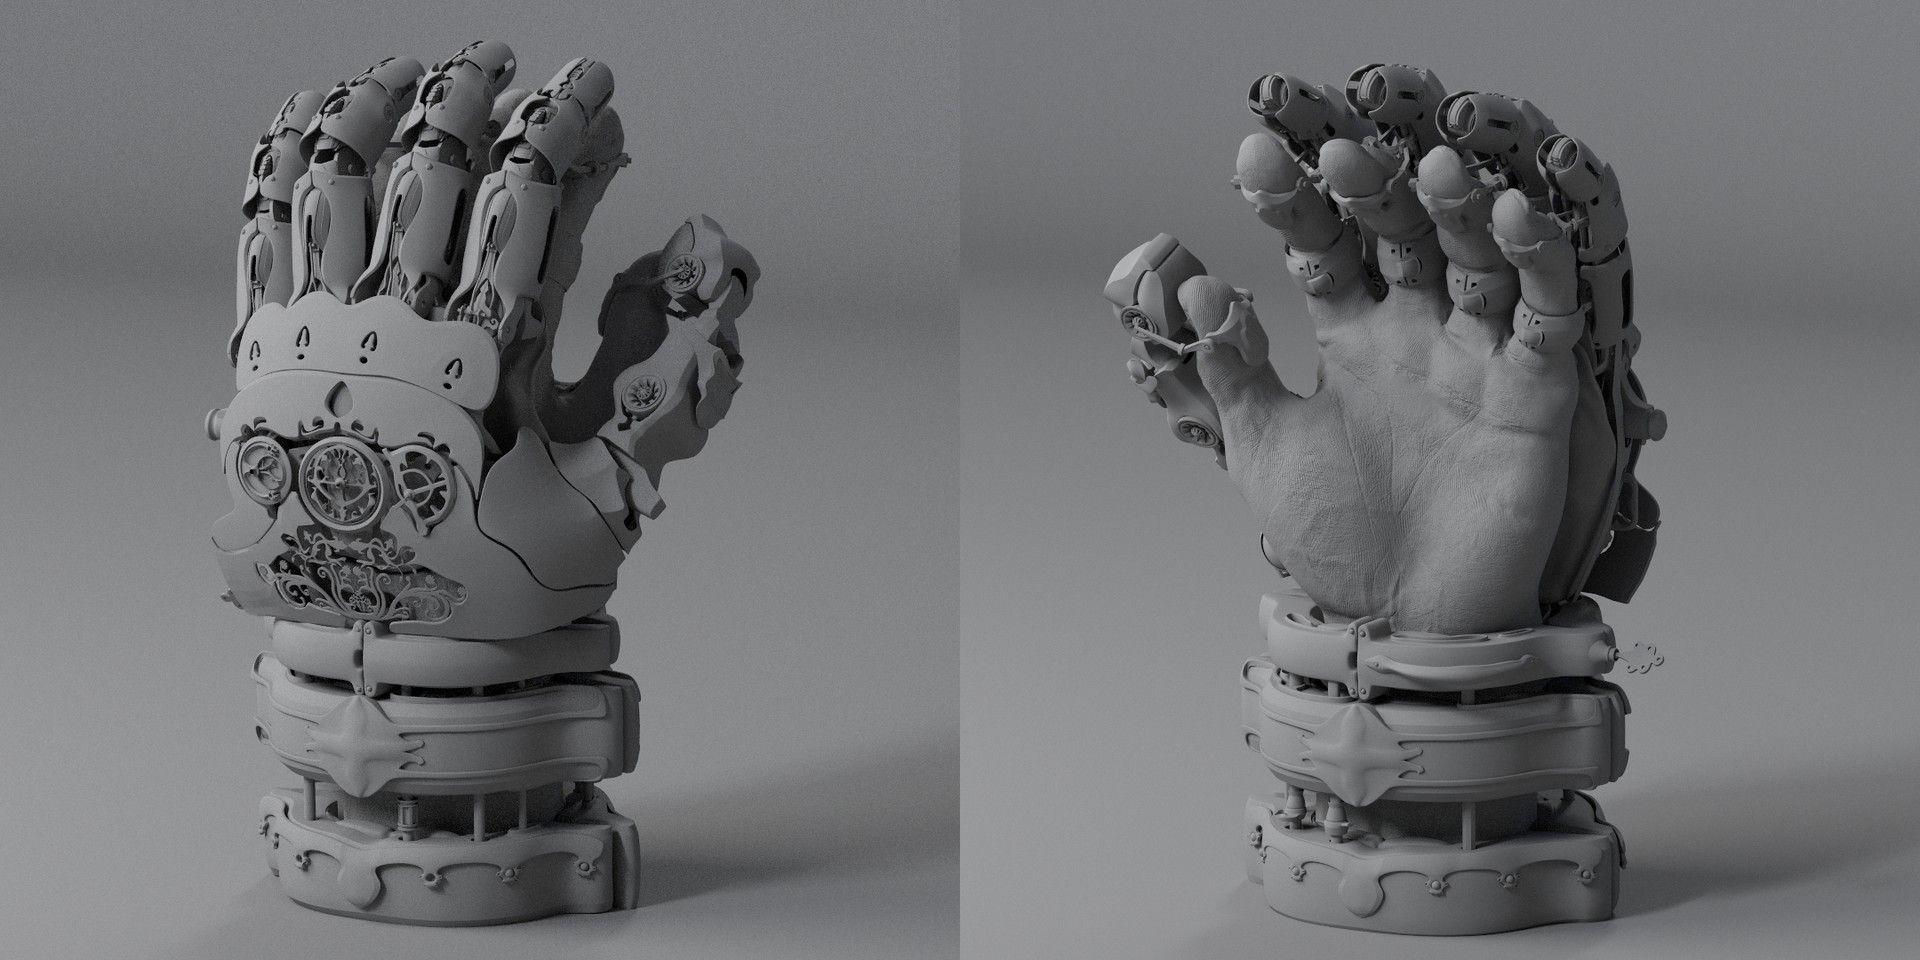 ArtStation - Steampunk Royal Gauntlet, Tuna Unalan